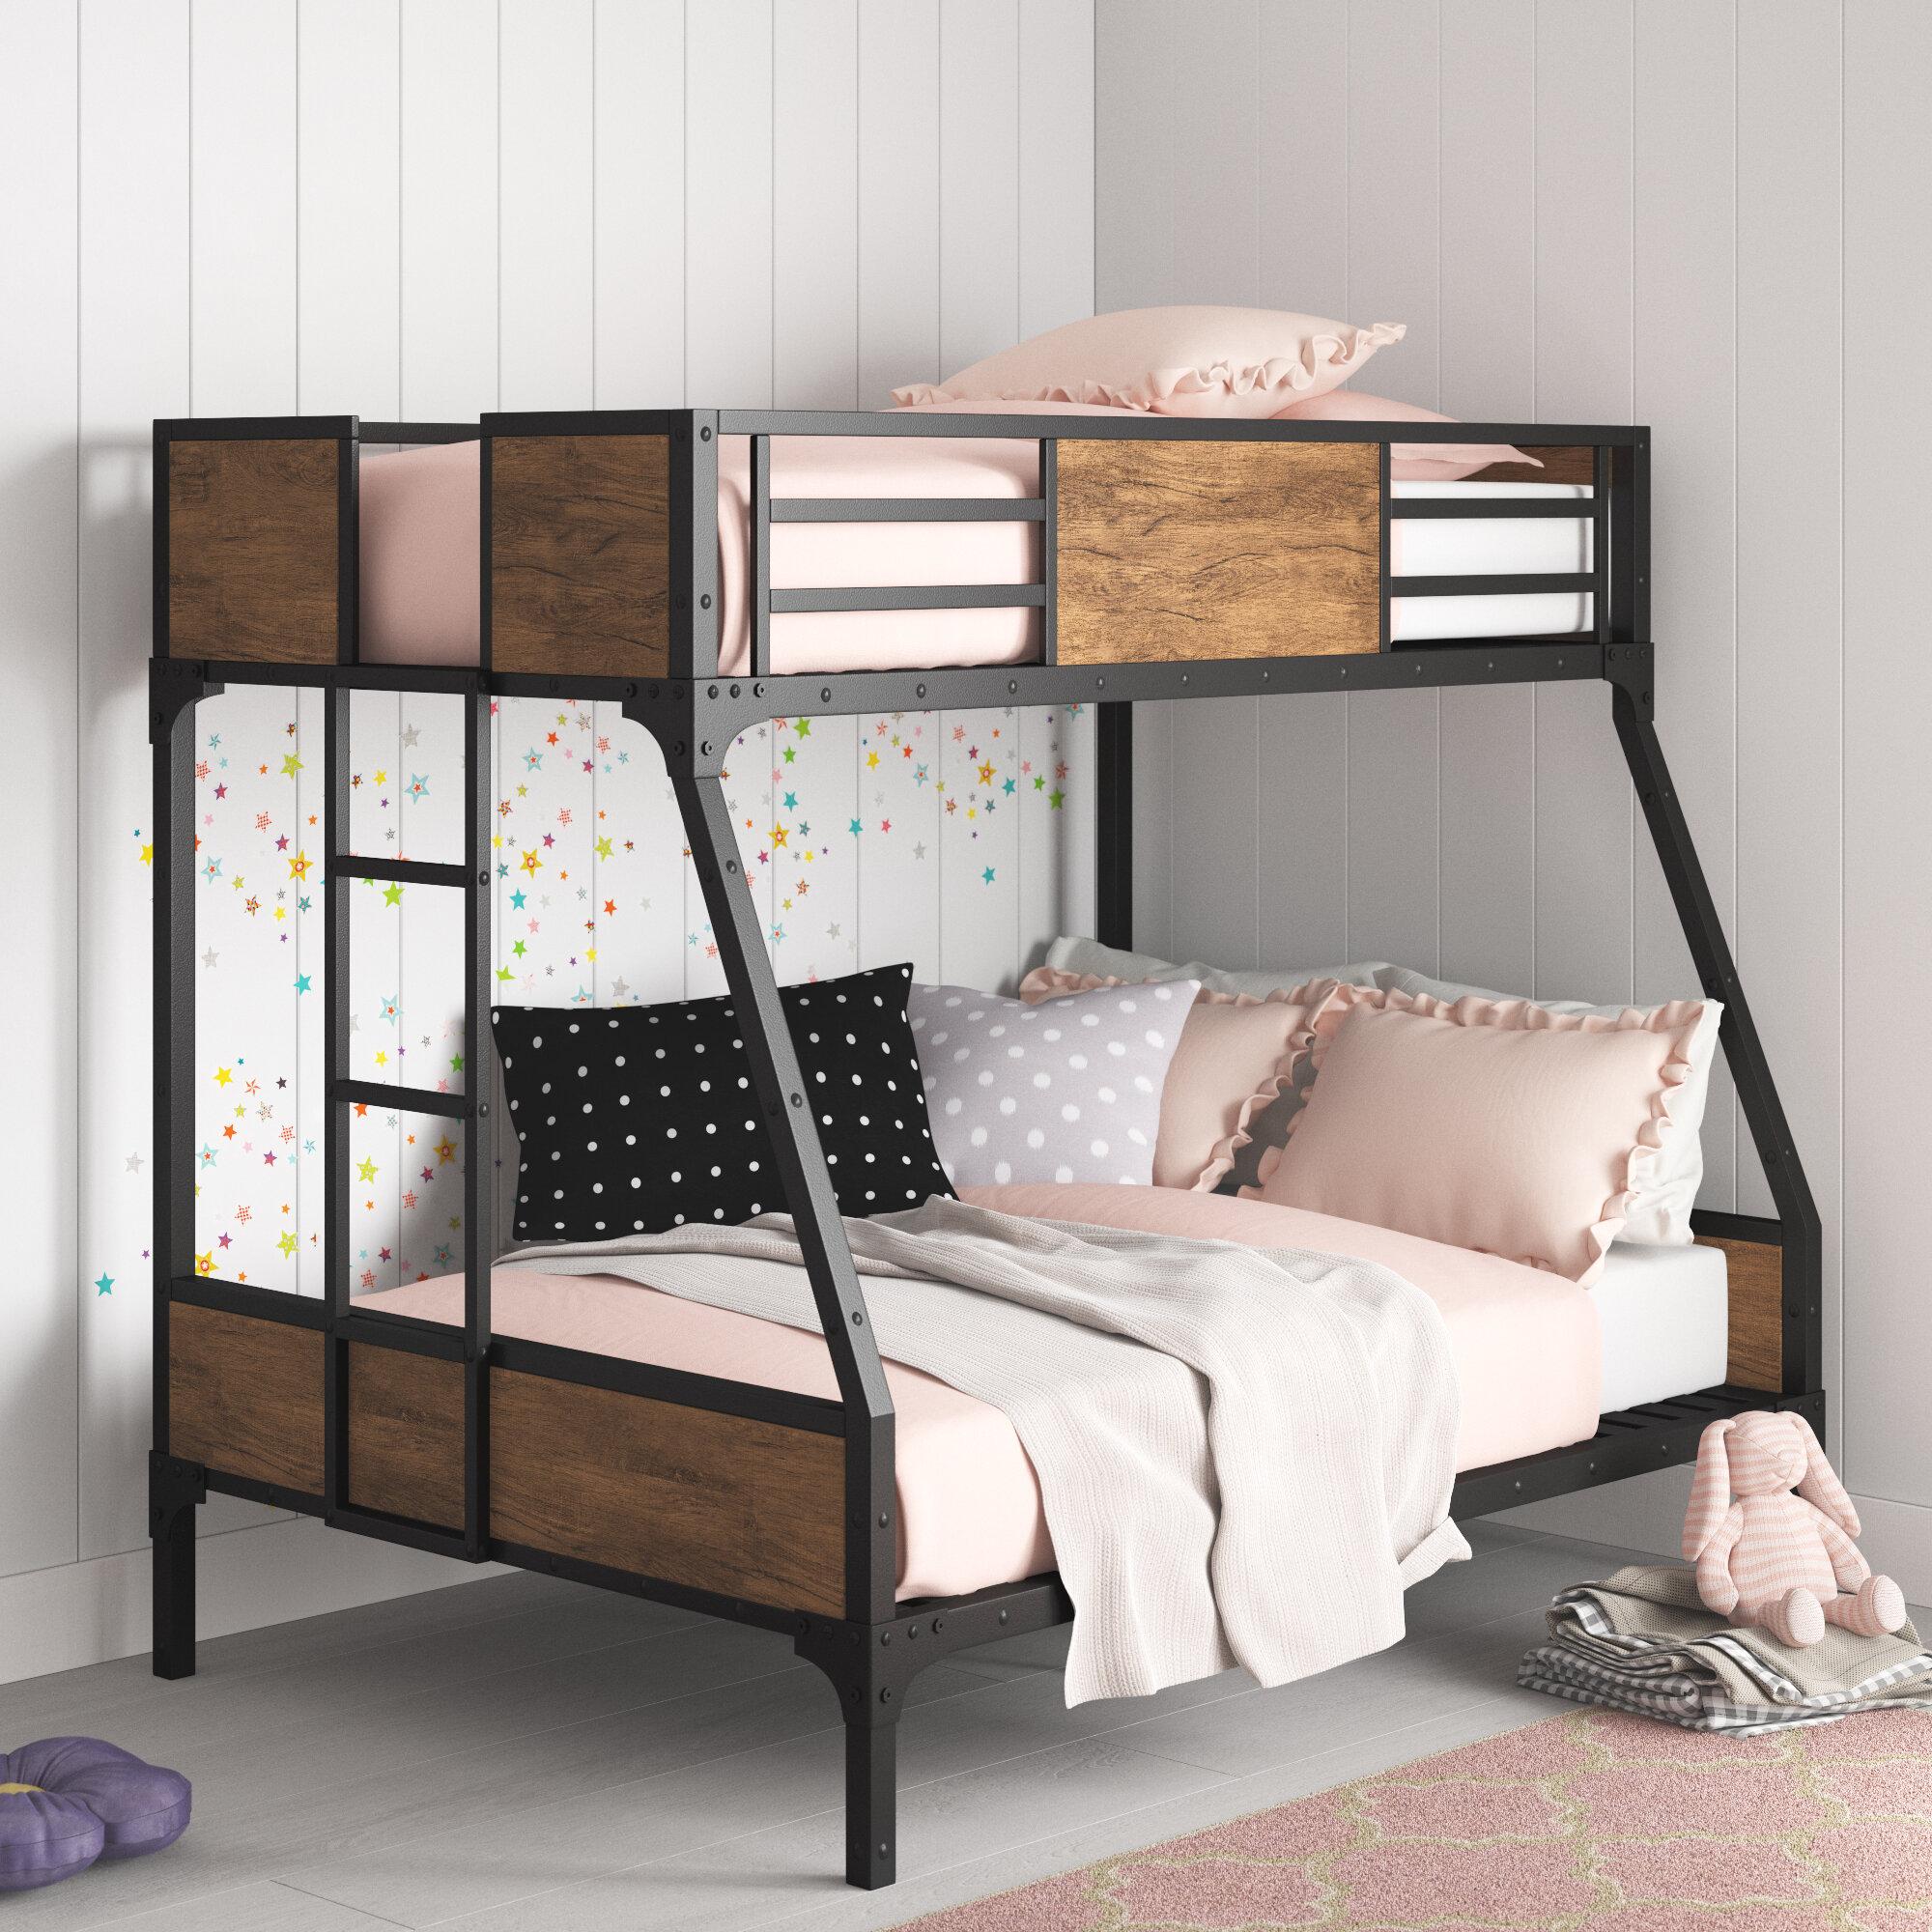 Harriet Bee Fresno Twin Over Full Bunk Bed Reviews